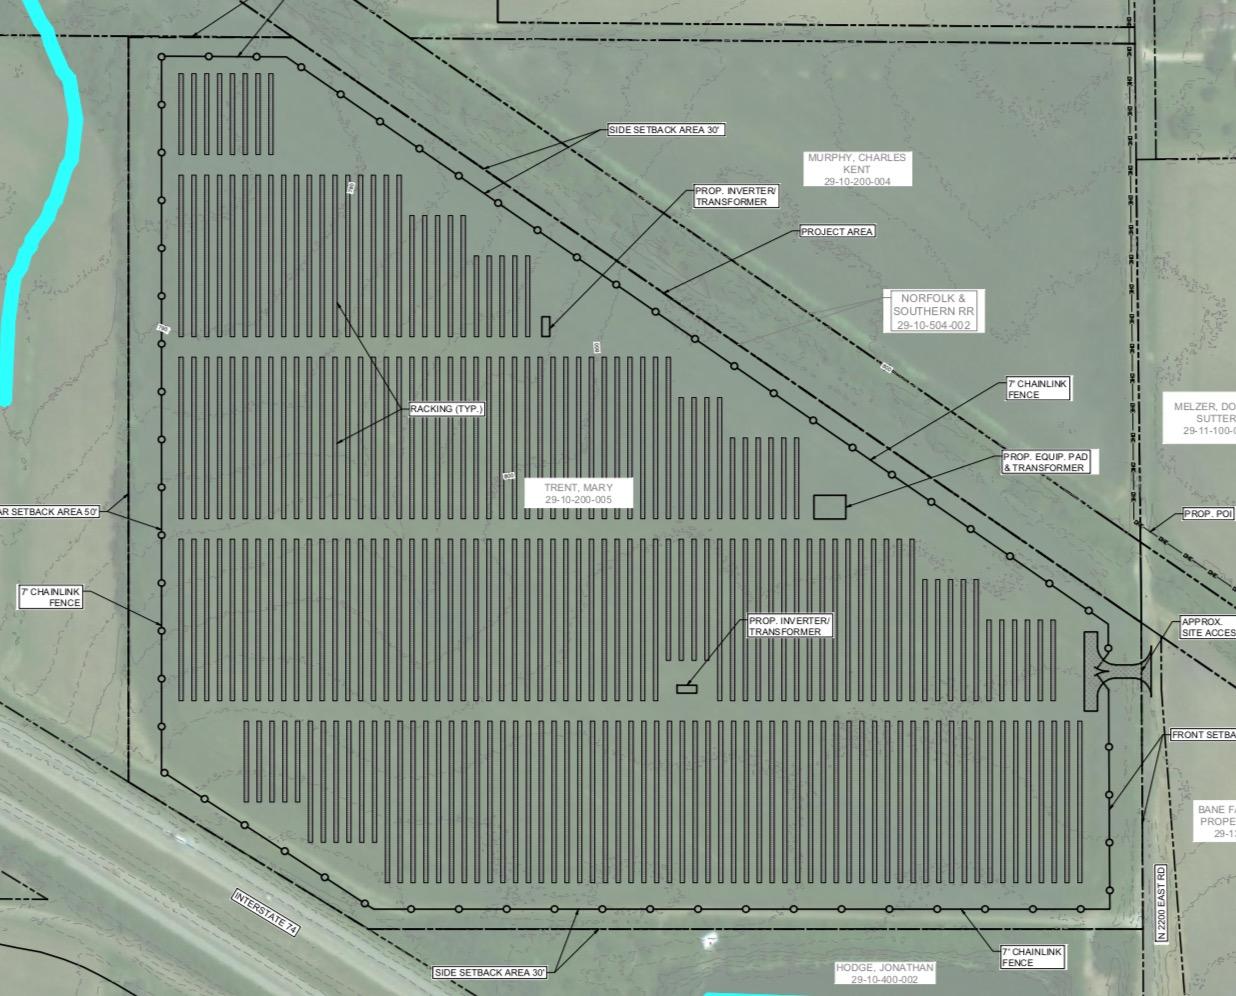 The Moraine site 6450 County Rd 2200 E, Downs